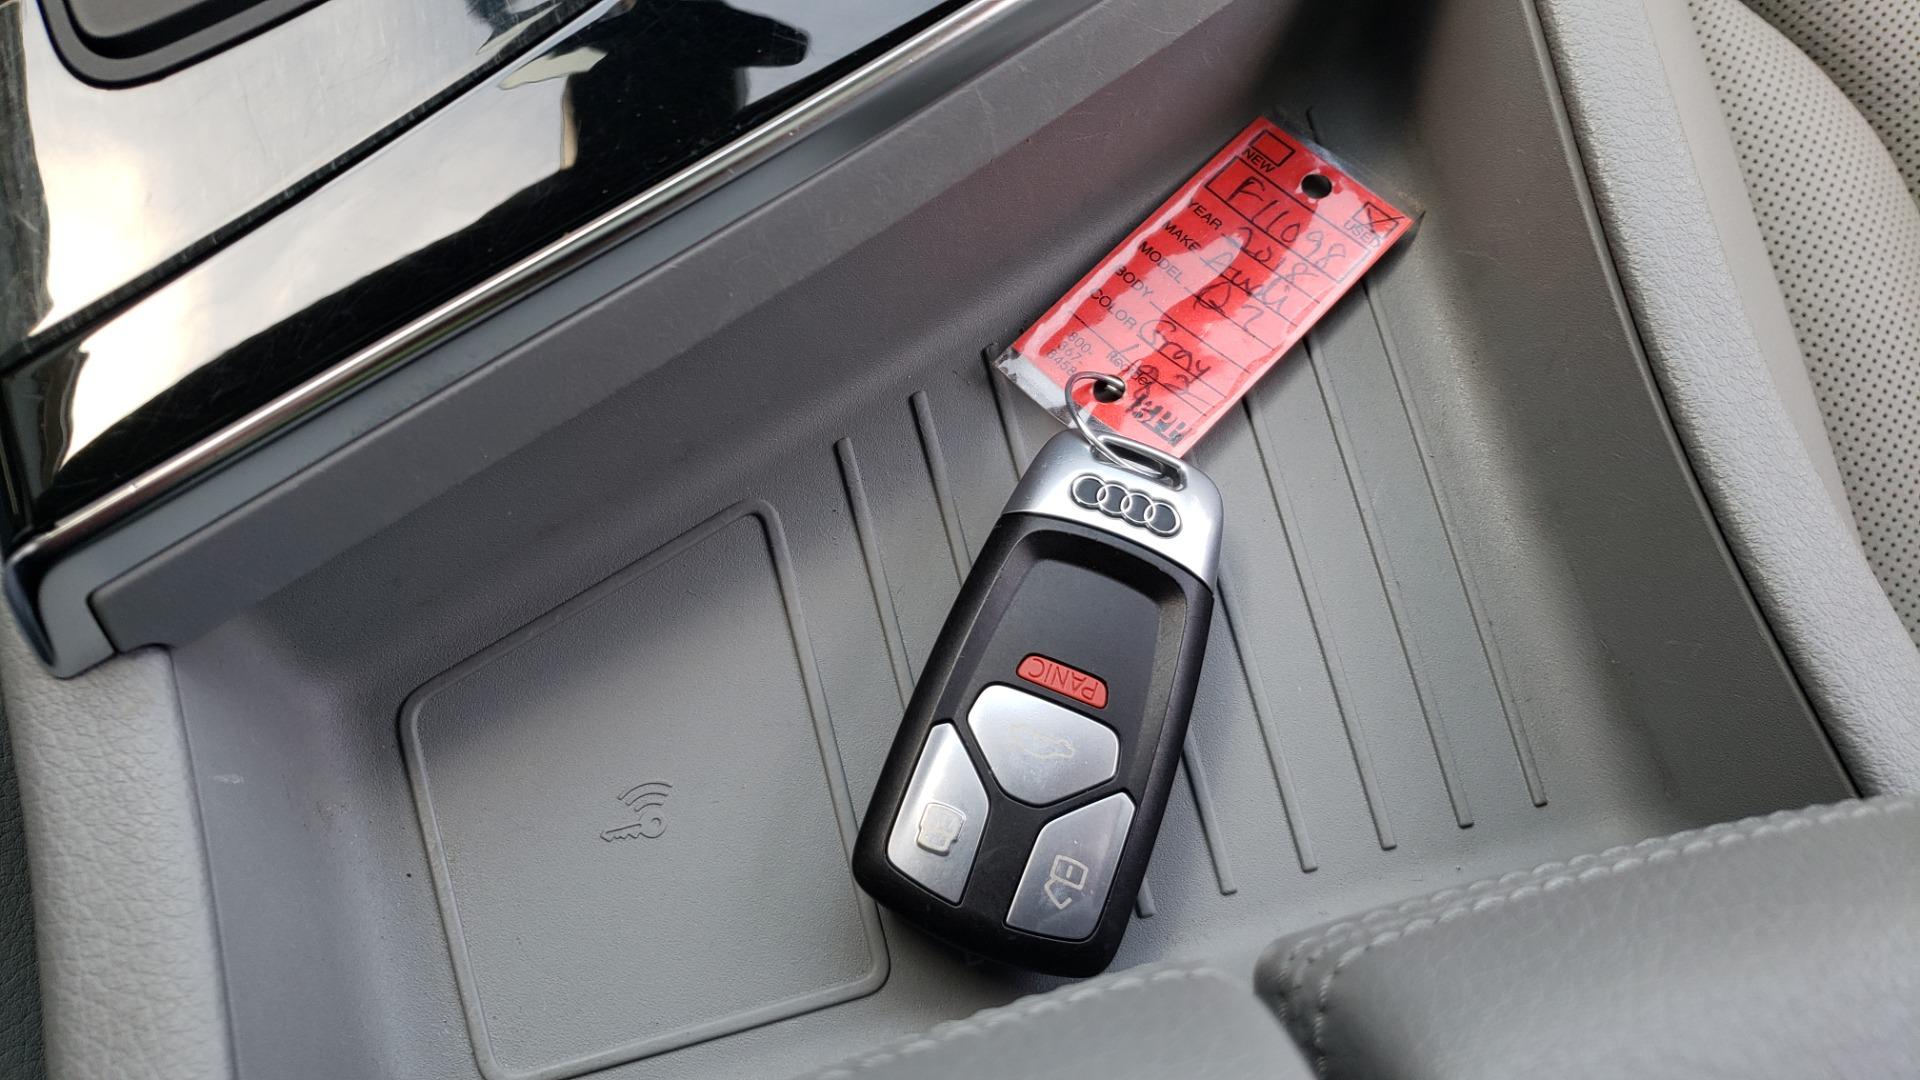 Used 2018 Audi Q7 PRESTIGE TIPTRONIC / NAV / SUNROOF / ADAPTIVE PKG / DRVR ASST / CLD WTHR /  for sale $49,995 at Formula Imports in Charlotte NC 28227 54